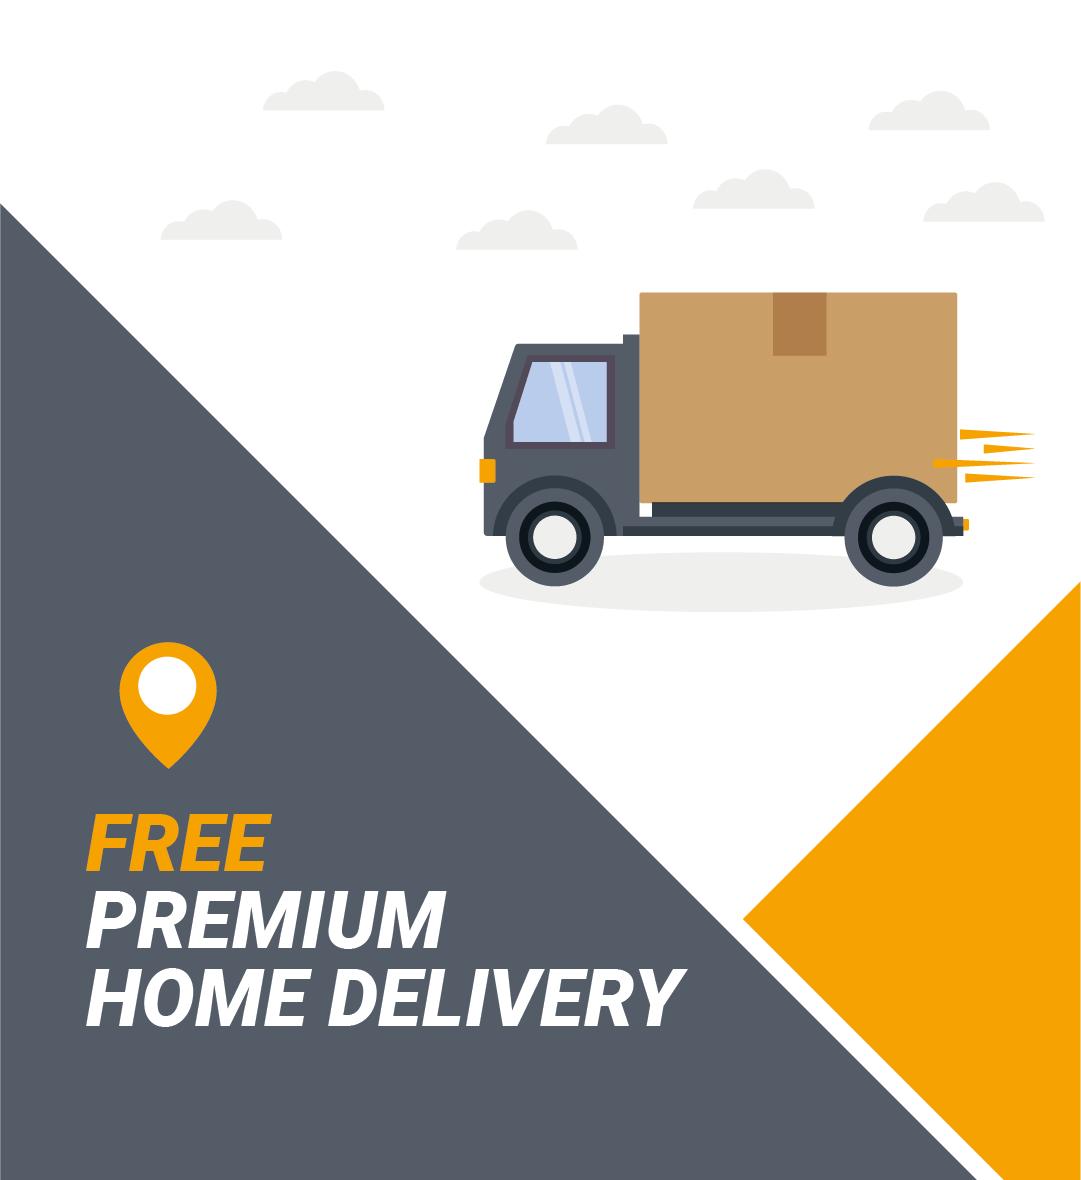 FREE Home Premium Delivery